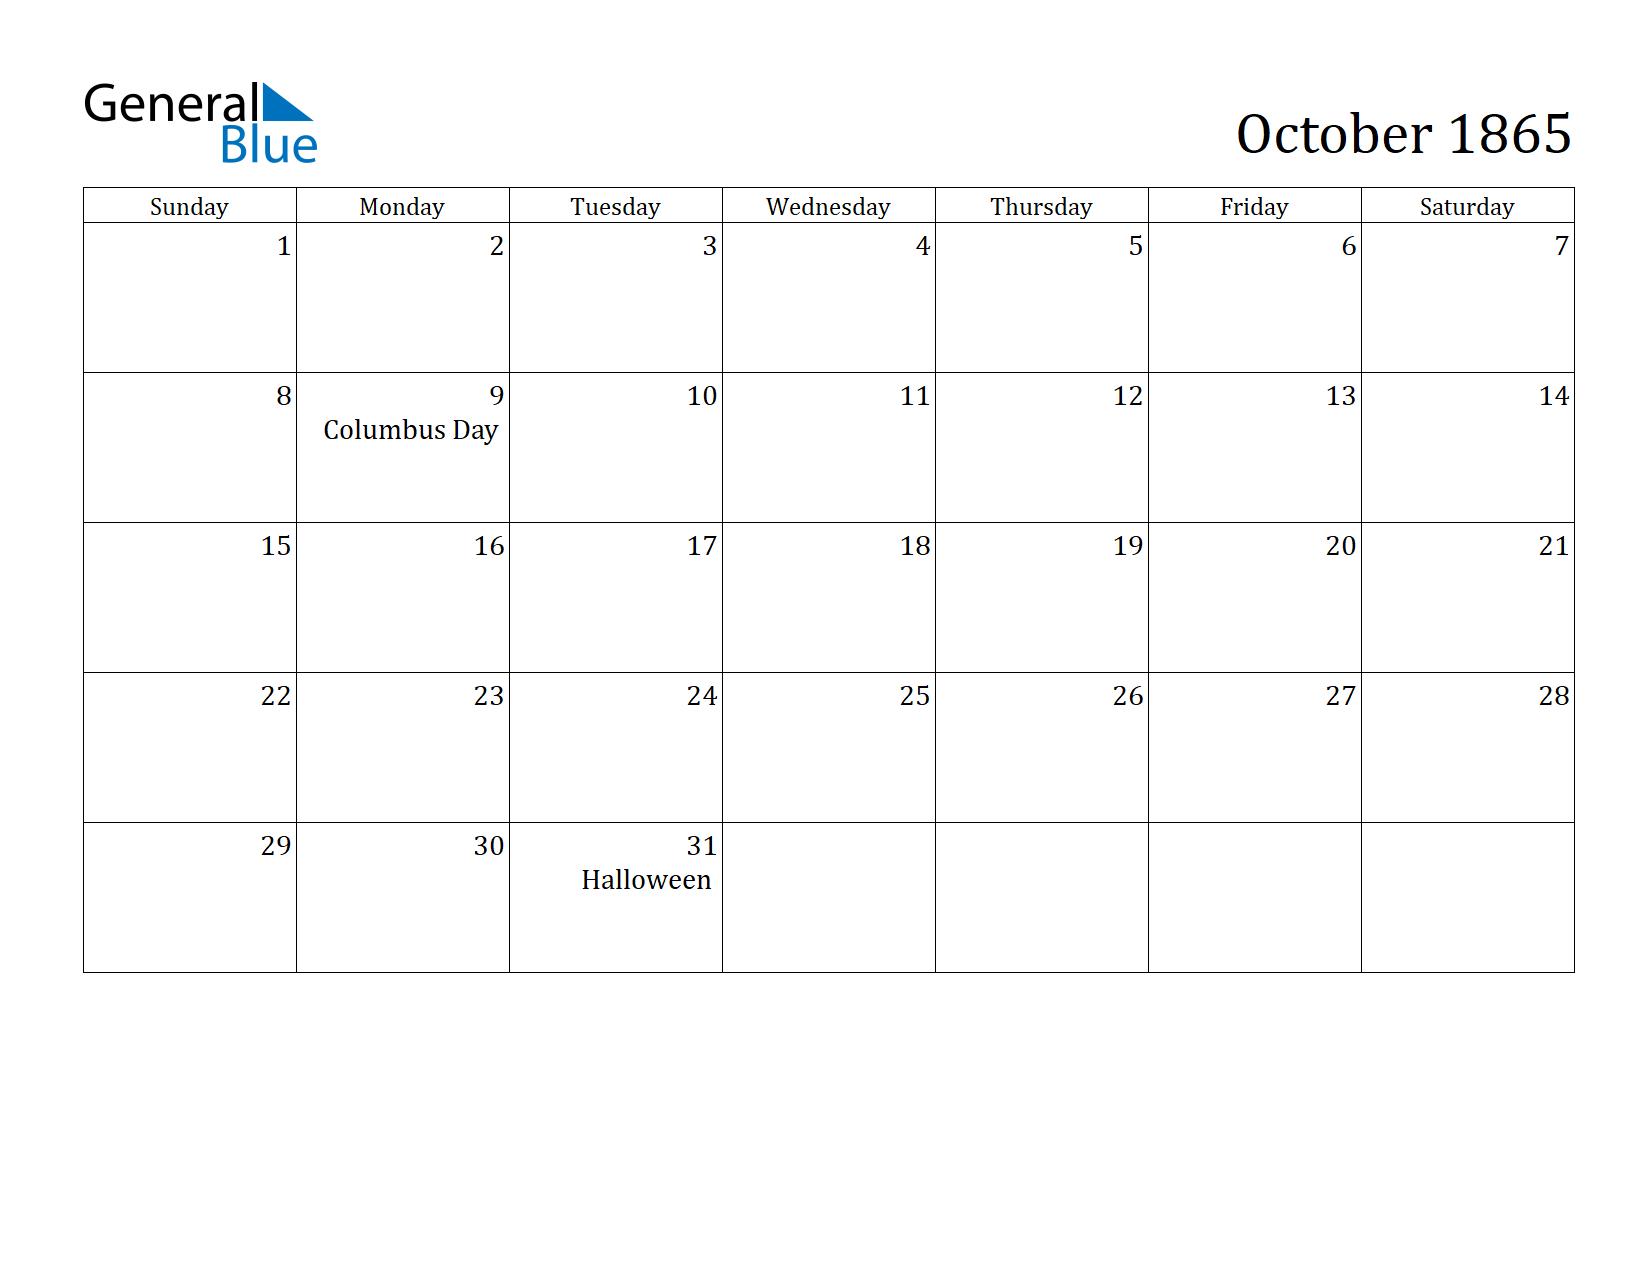 Image of October 1865 Calendar